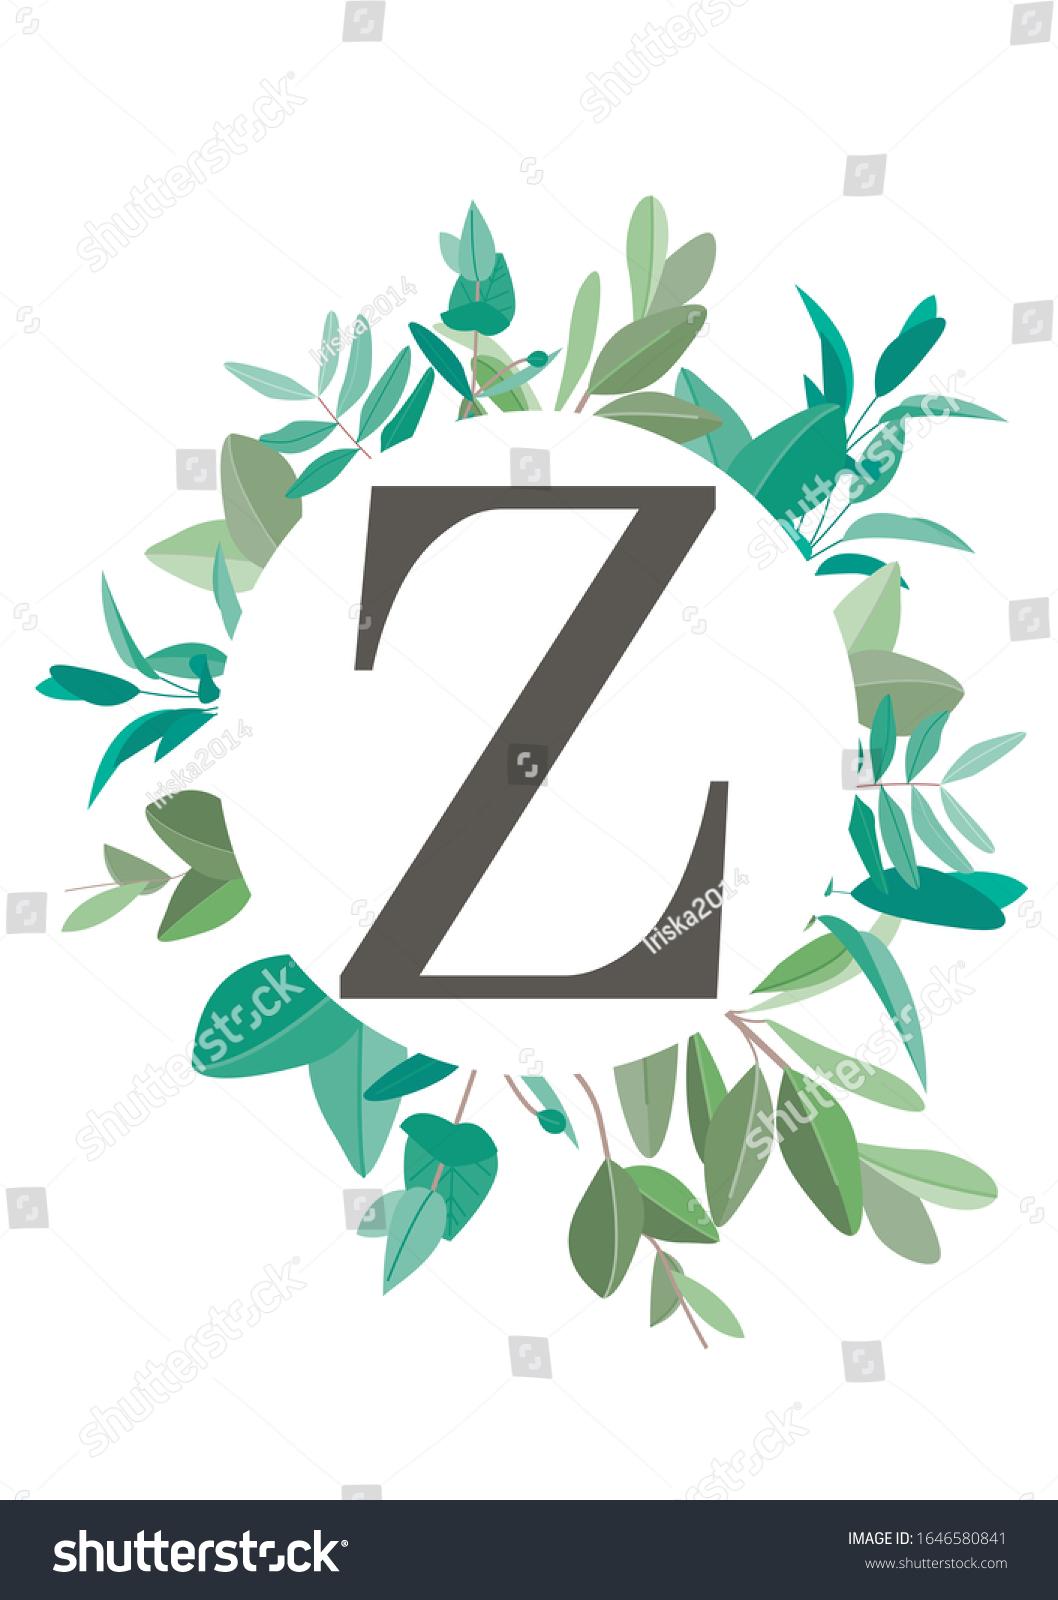 Alphabet letters a z printable Printable Alphabet